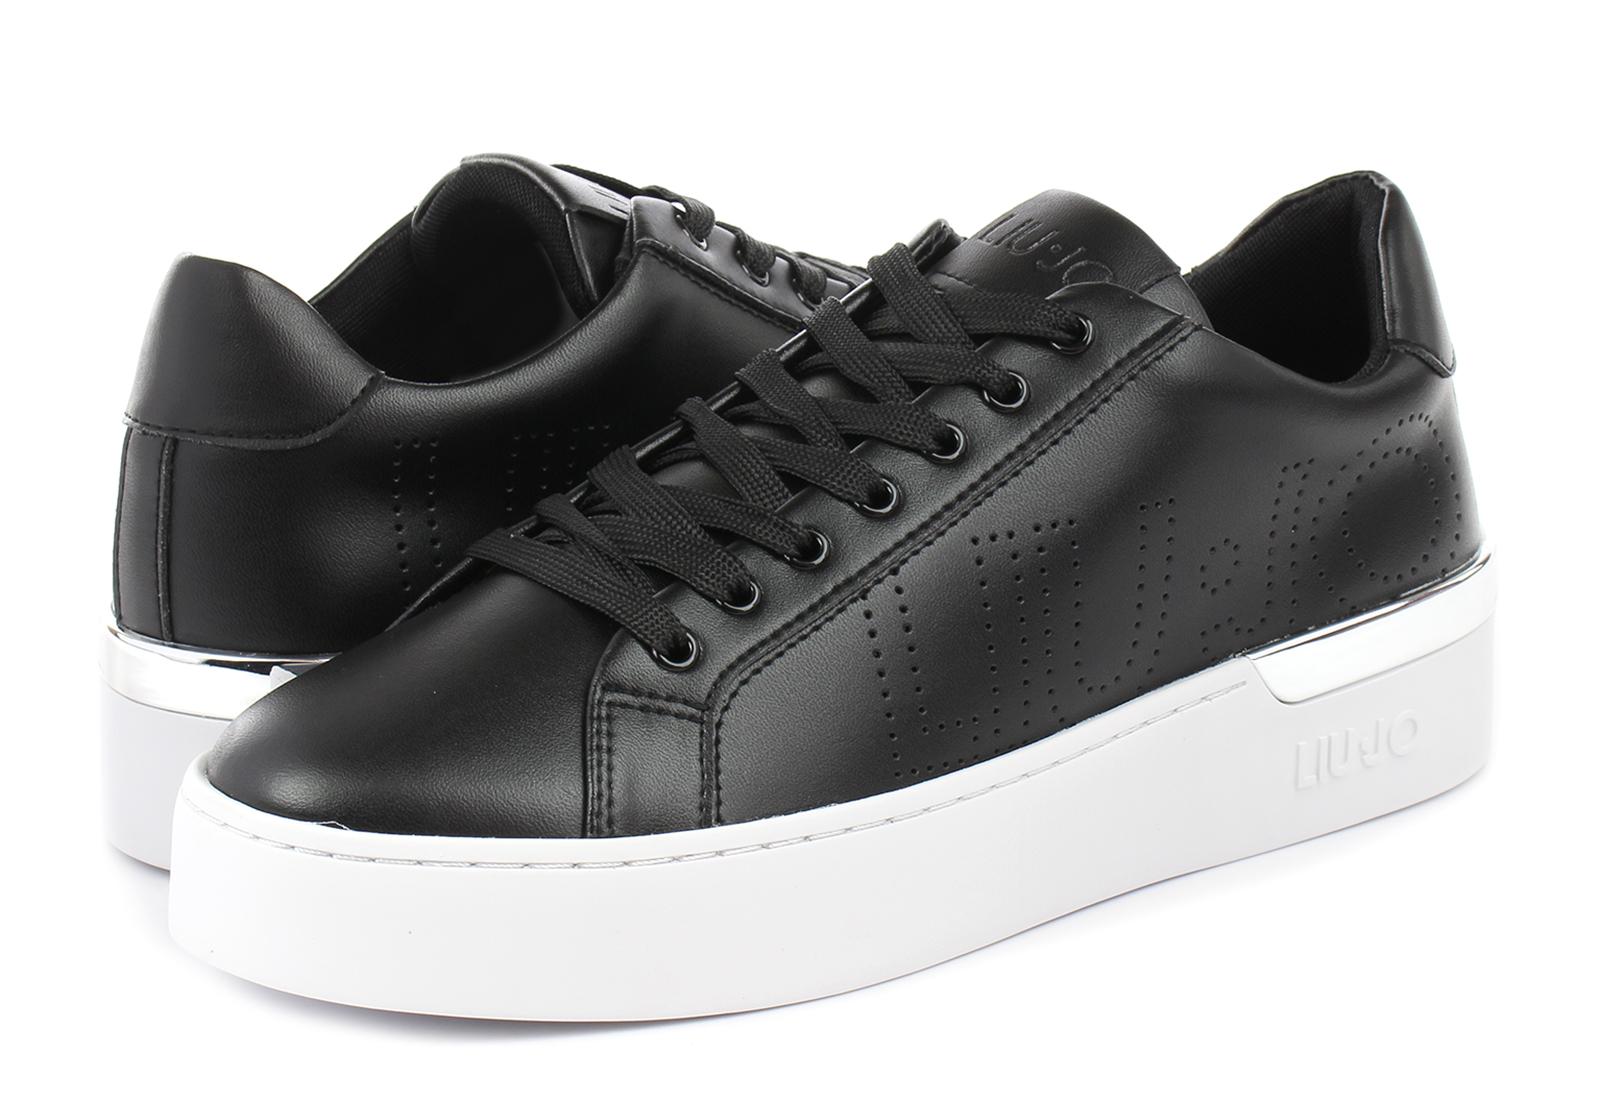 Exactitud Deportista recuerda  Liu Jo Shoes - Silvia 10 - BA0027EX014-BLK - Online shop for sneakers,  shoes and boots